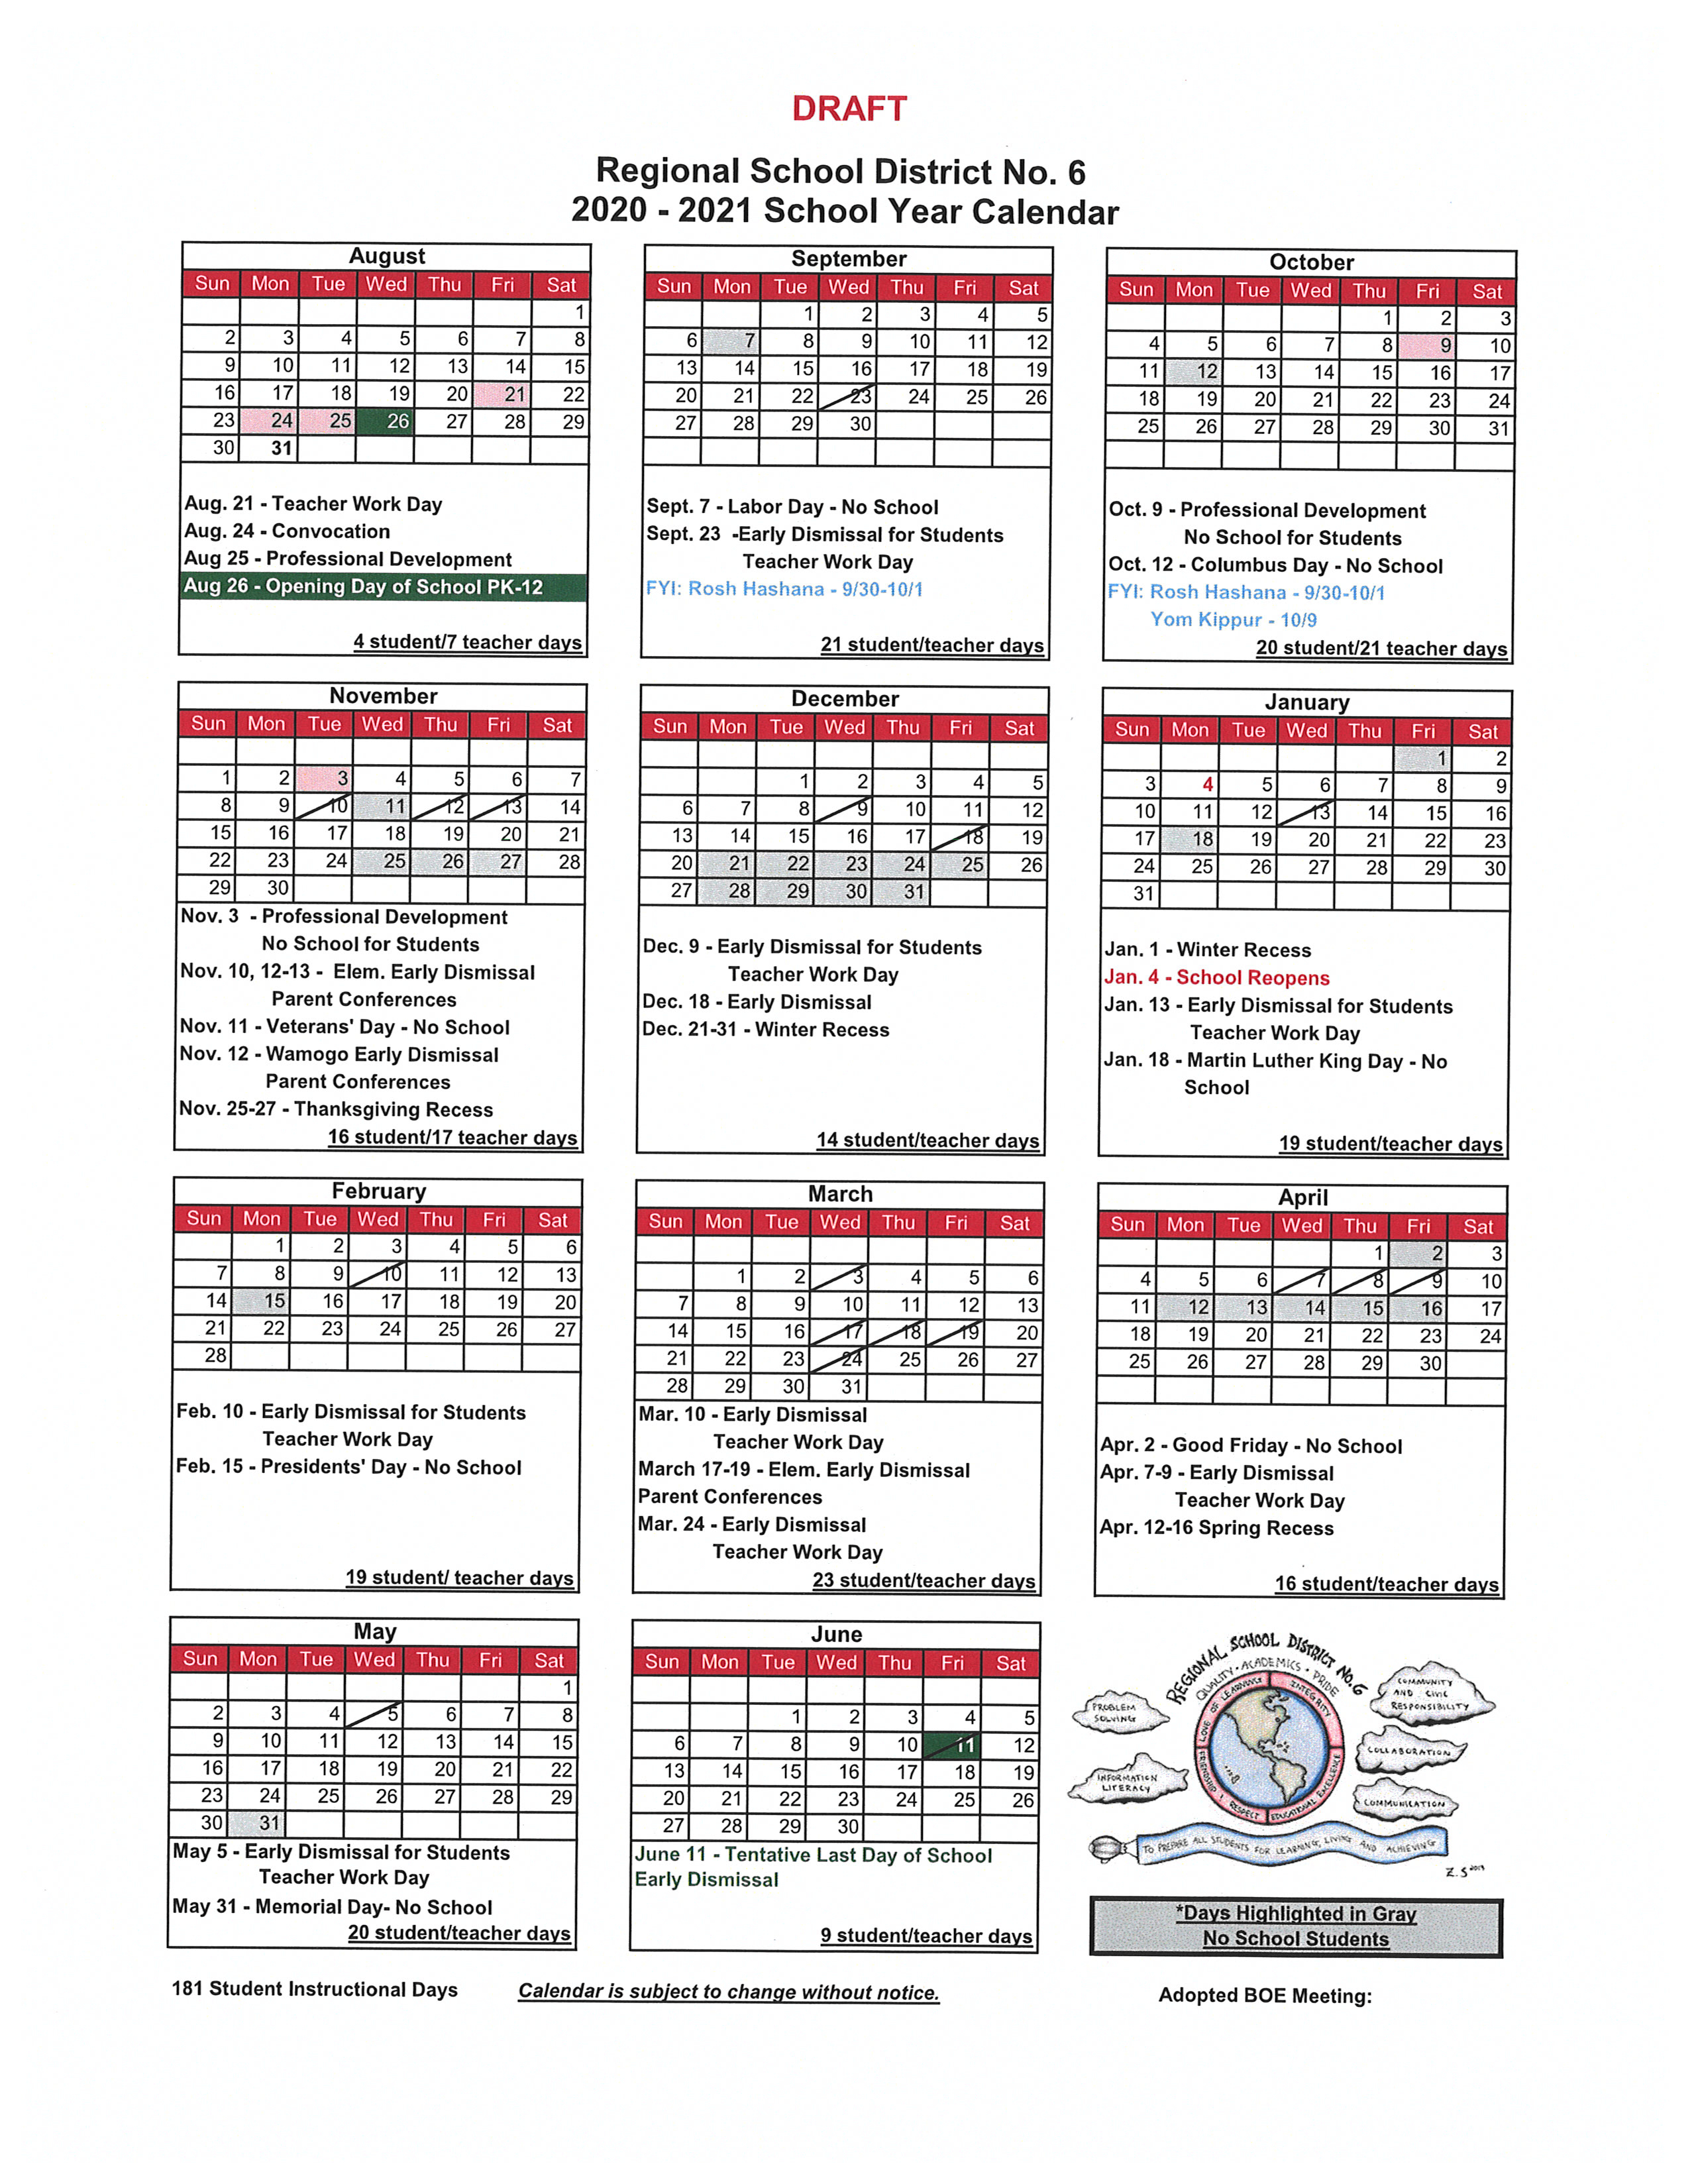 Draft 2020 2021 School Calendar - Regional School District No. 6 Inside Sunny Hills High School Calendar 2021